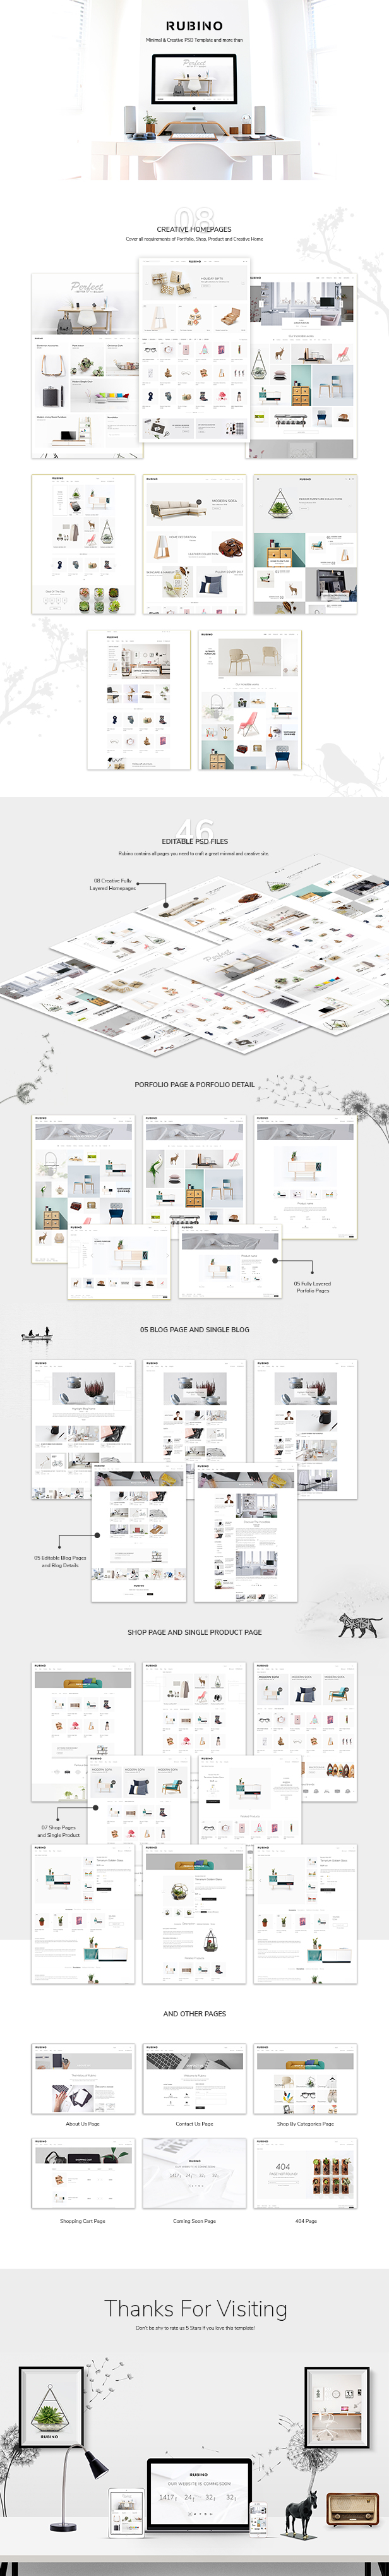 Rubino - Minimal & Creative PSD Template - 2